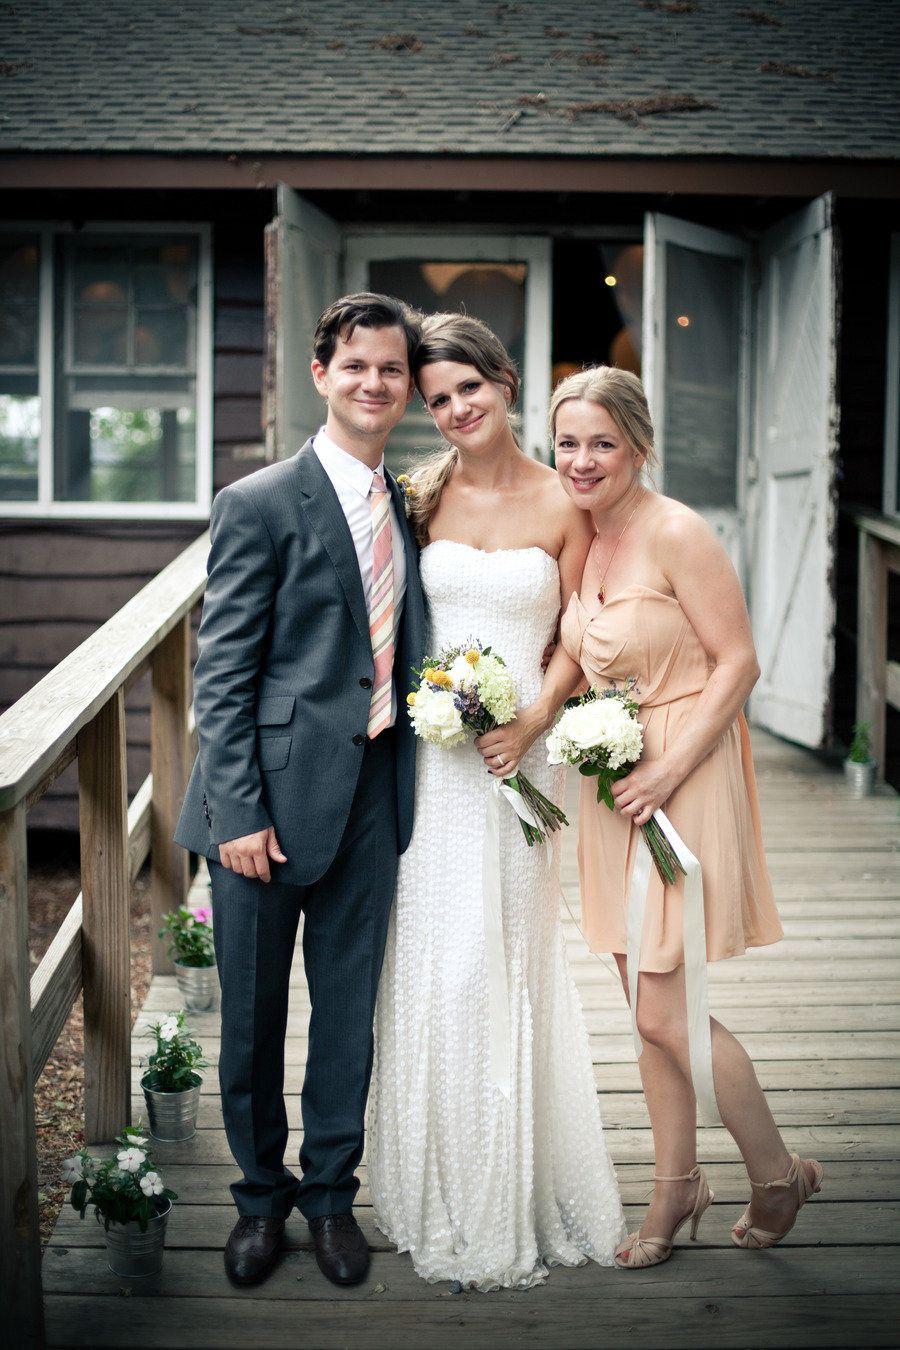 Upstate new york wedding from stylish and hip weddings hip wedding